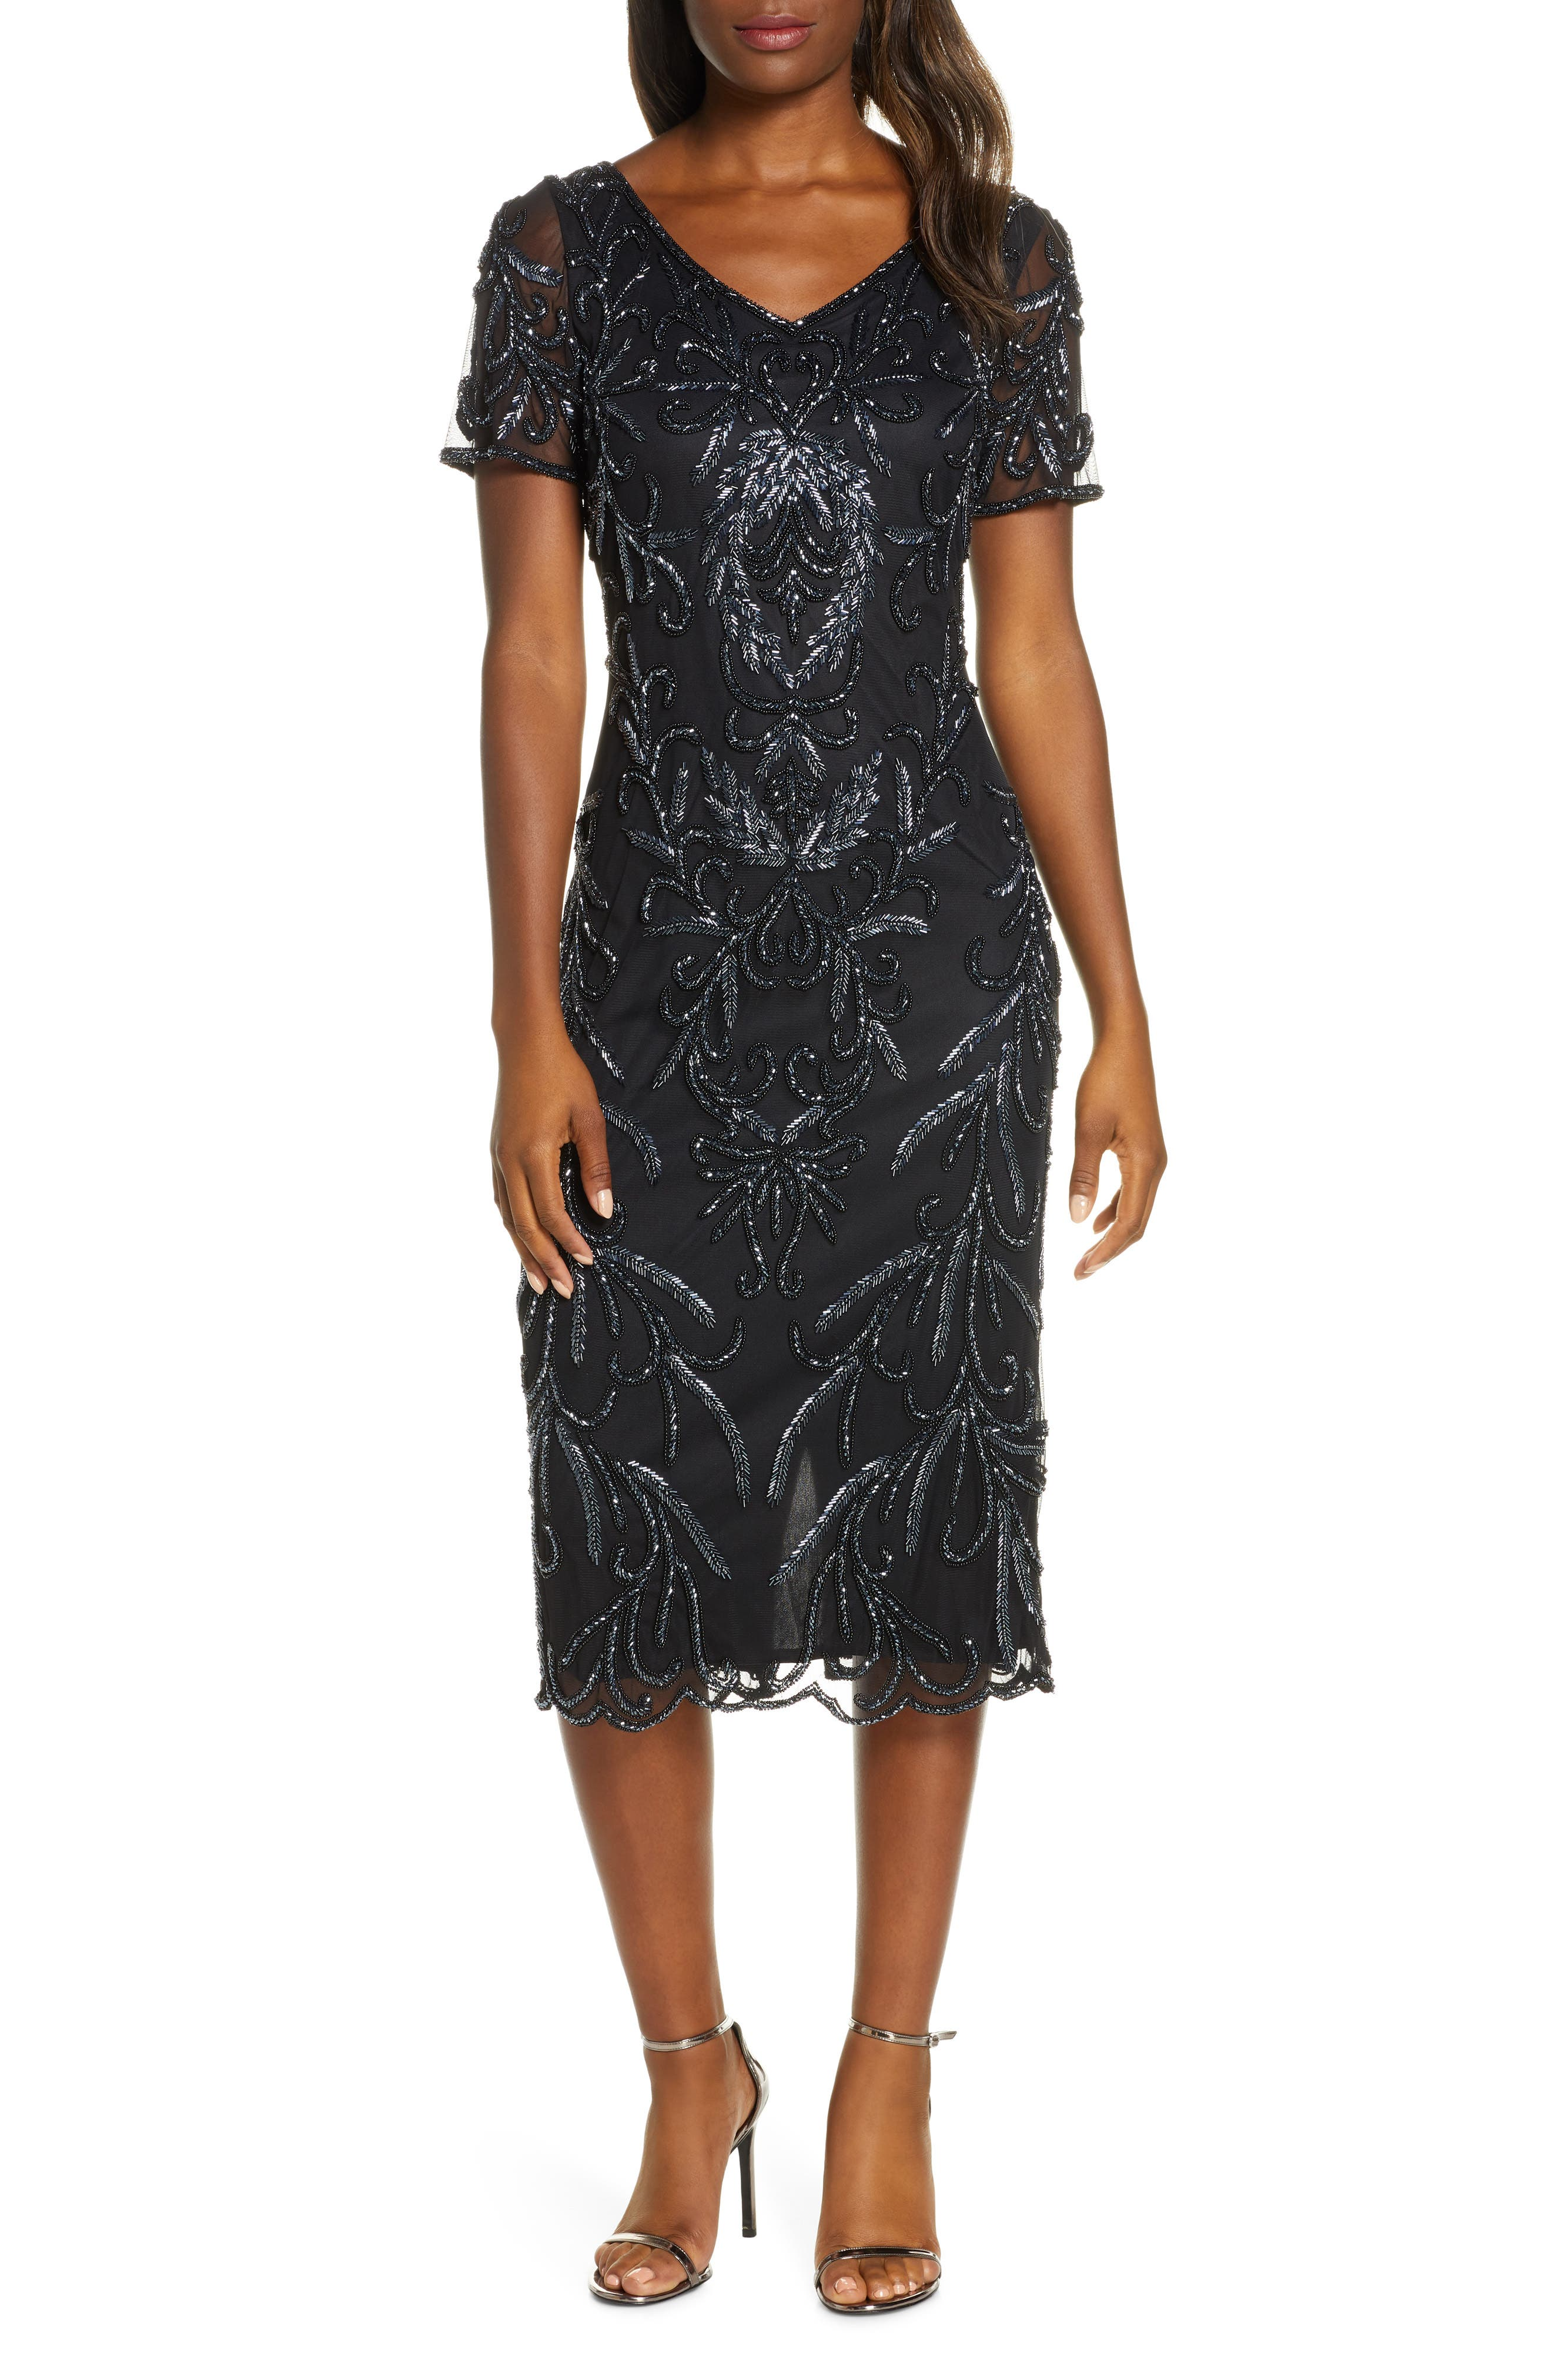 Charleston Dress: Fringe Flapper Dress Womens Pisarro Nights Beaded Midi Dress $218.00 AT vintagedancer.com